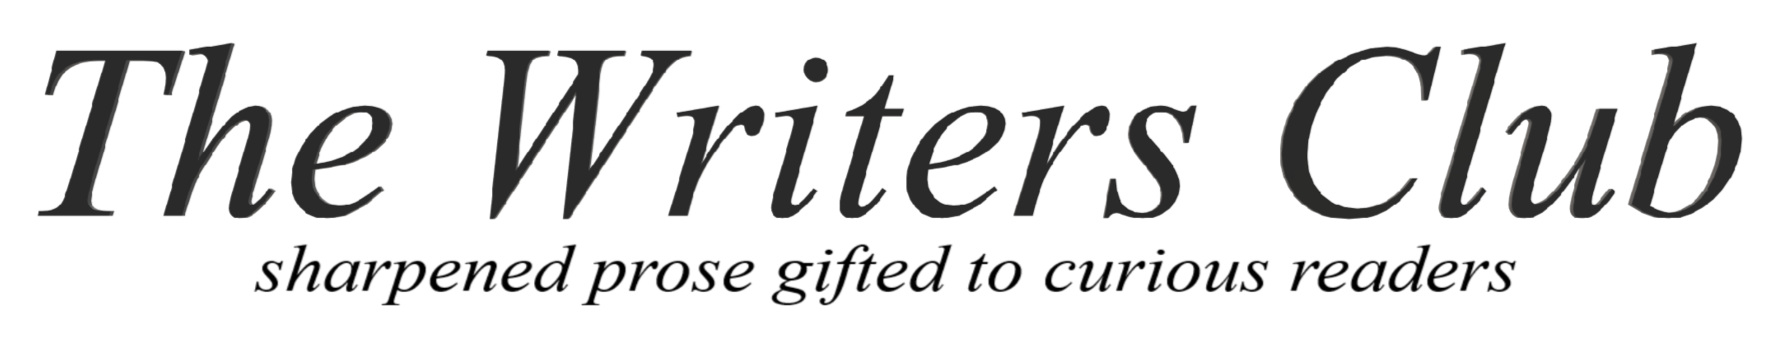 1_The_Writers_Club_Improved_rgb.jpg